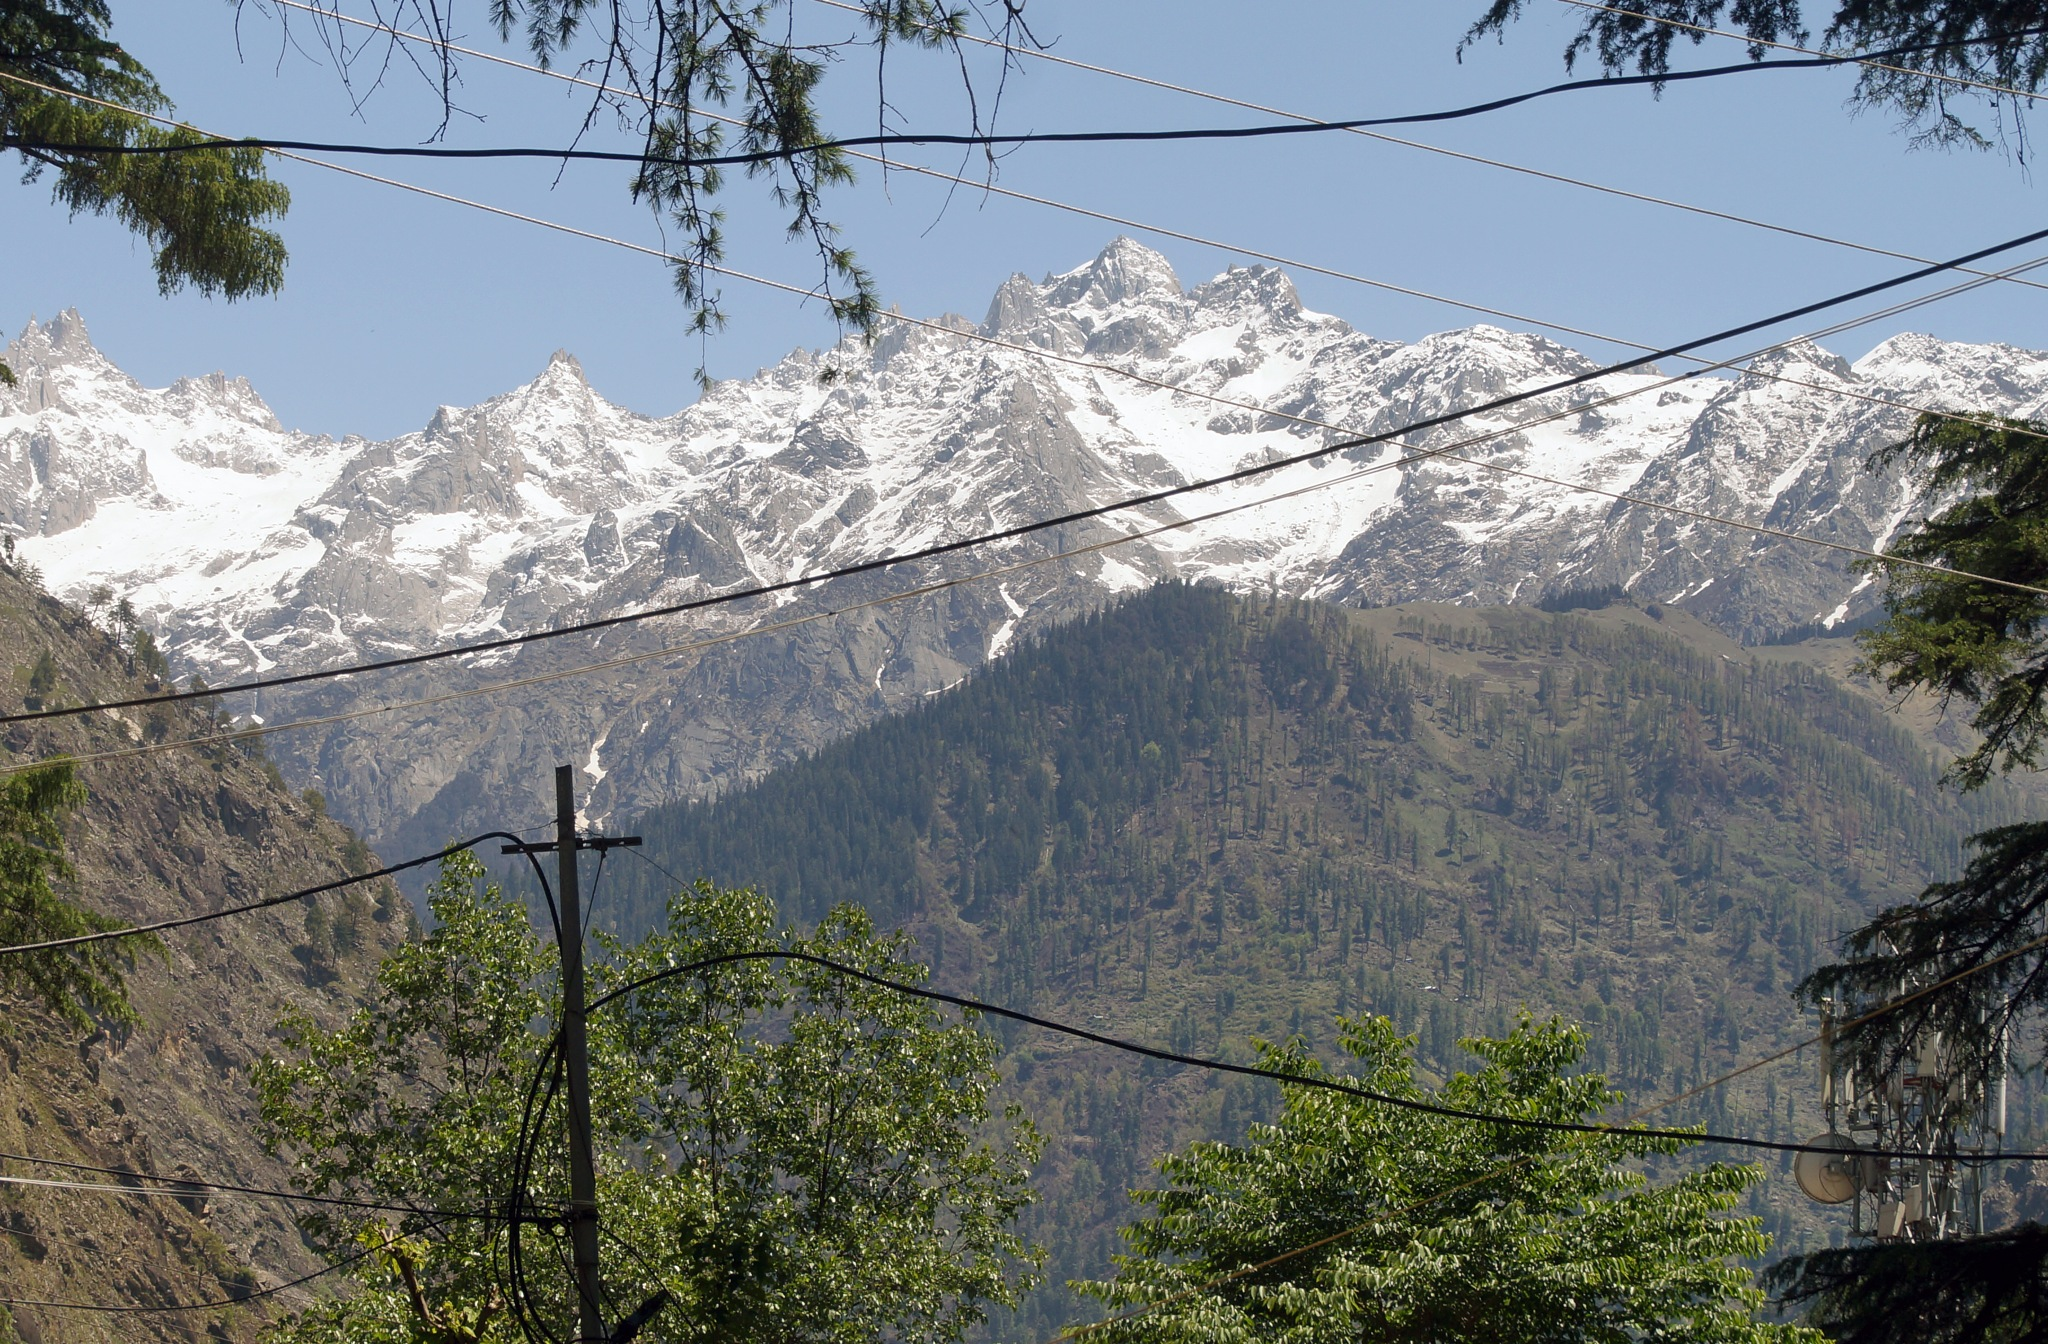 Kasol, Himachal Pradesh, India 2017 by lars.erlandsson.9